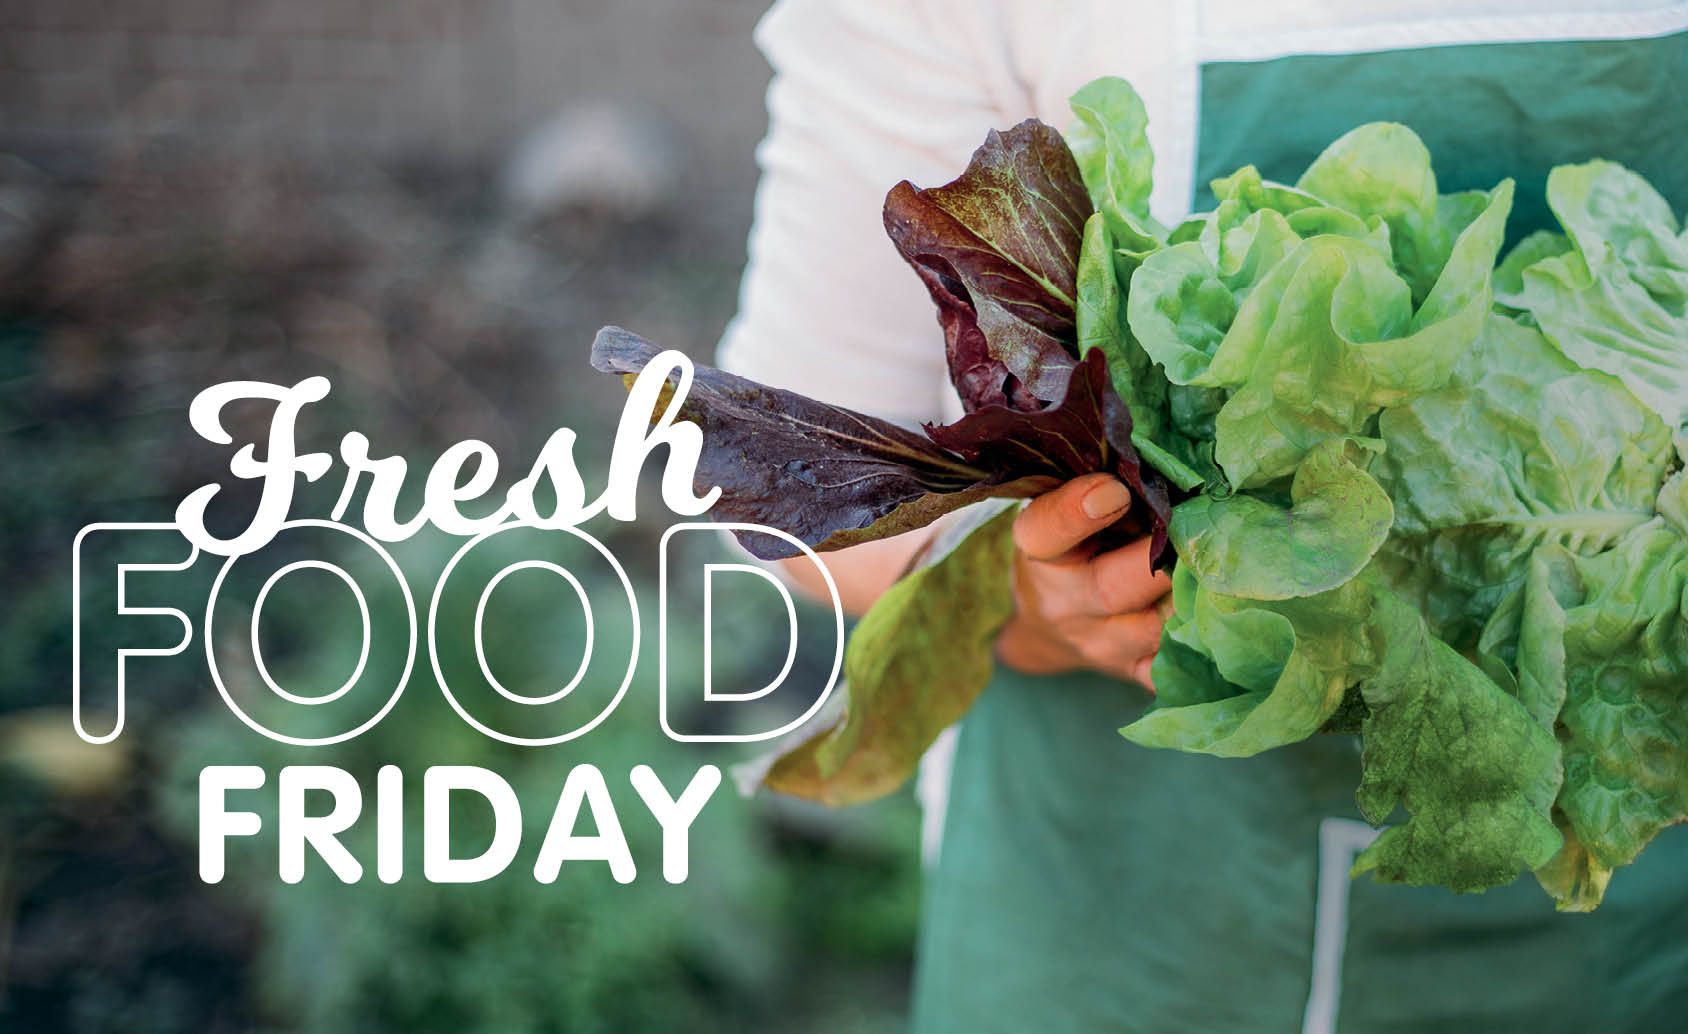 CH5514_Charter Hall_Rockdale_Fresh Food Friday_Web Tiles_FA_844x517